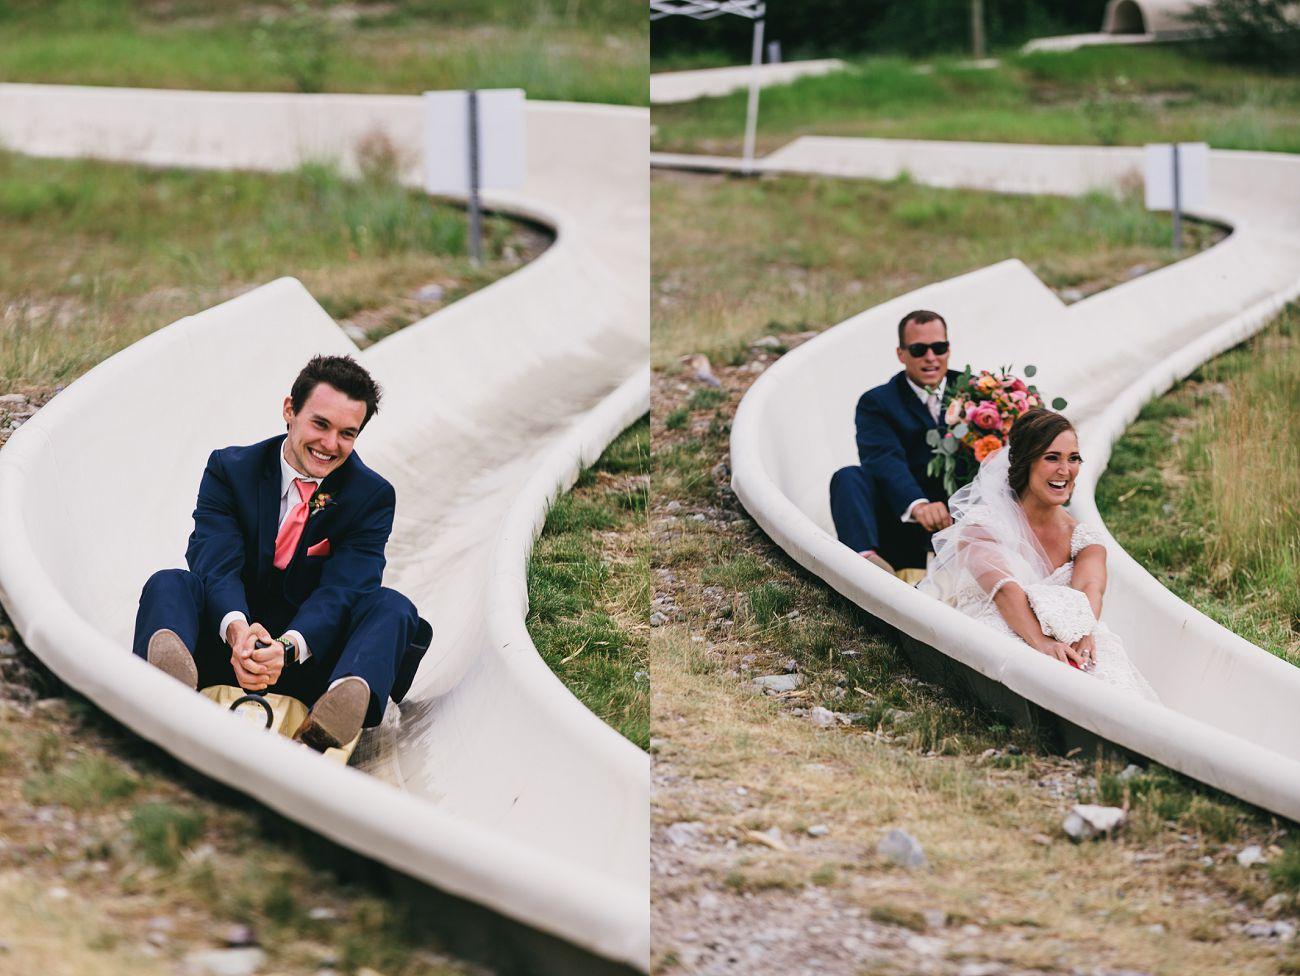 Jennifer_Mooney_Photo_Whitefish_Mountain_Resort_Wedding_00101.jpg